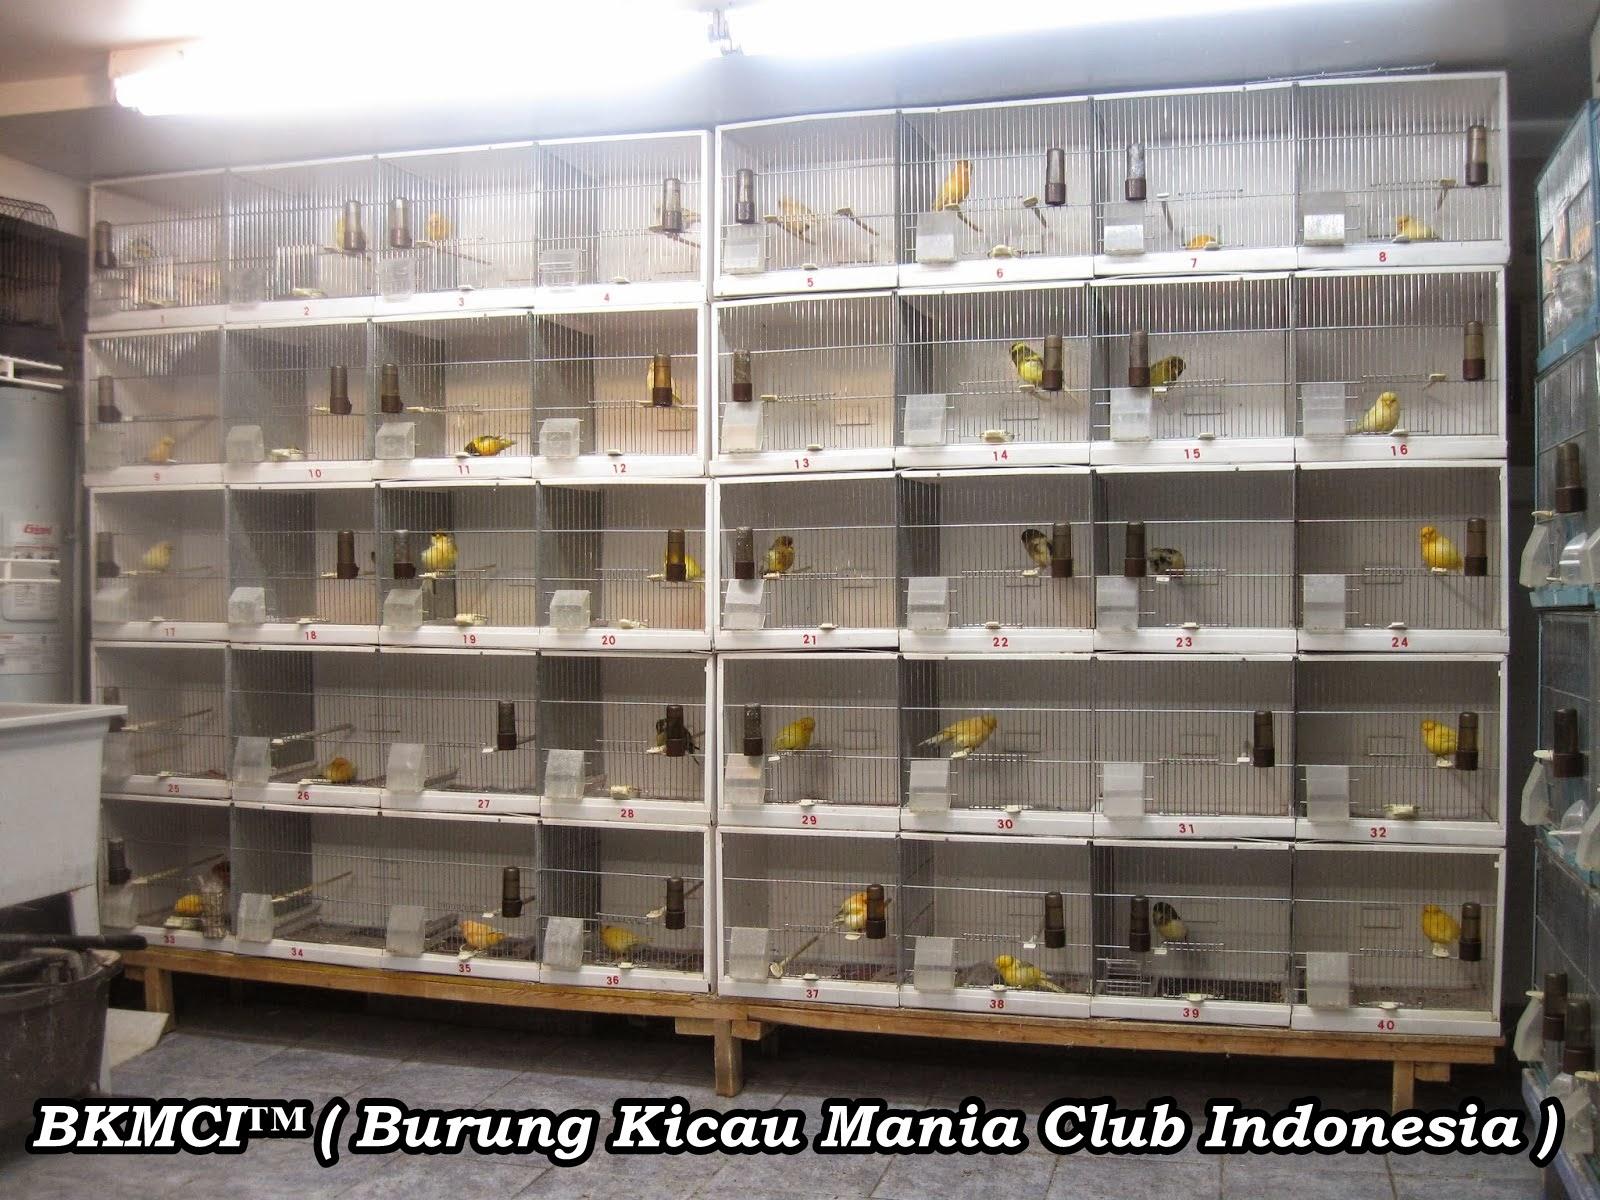 http://burungkicau-indonesia.blogspot.com/2014/11/cara-budidaya-ternak-burung-kenari.html